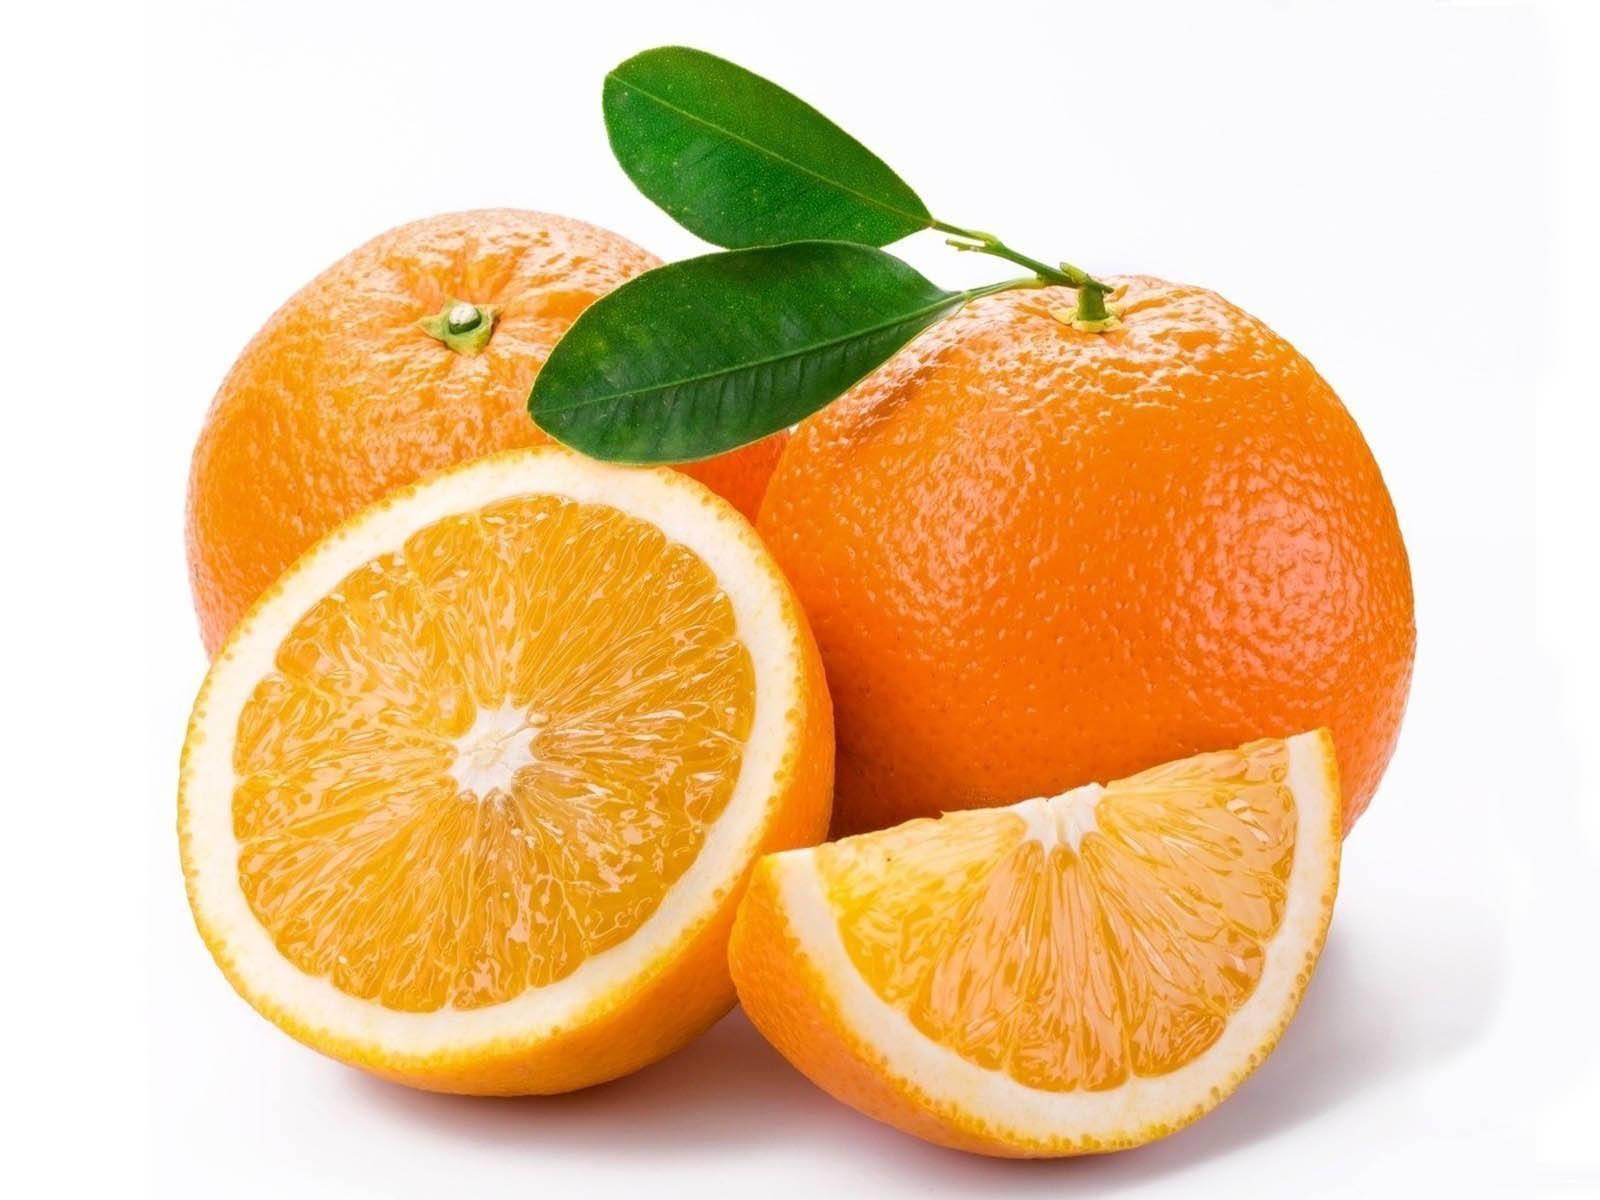 Winter-fruits-for-Kids-Orange